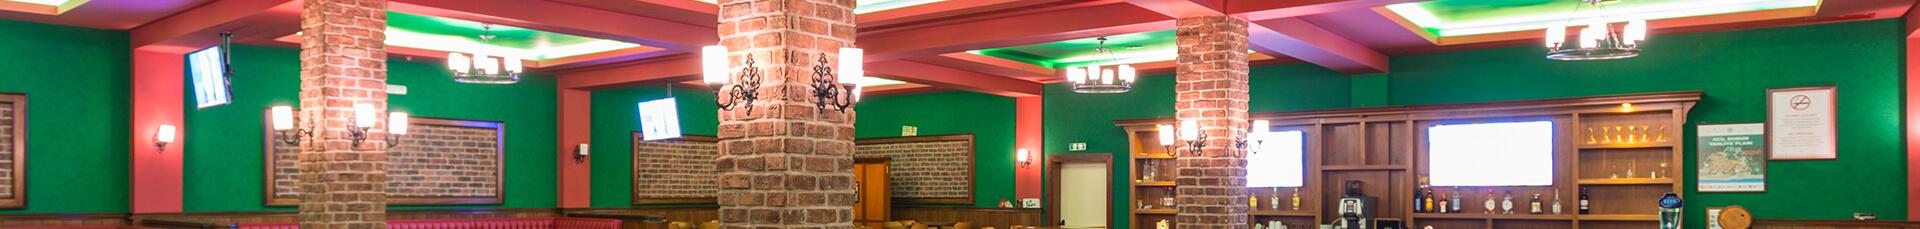 Ali Bey Park Manavgat - Ali's Pub